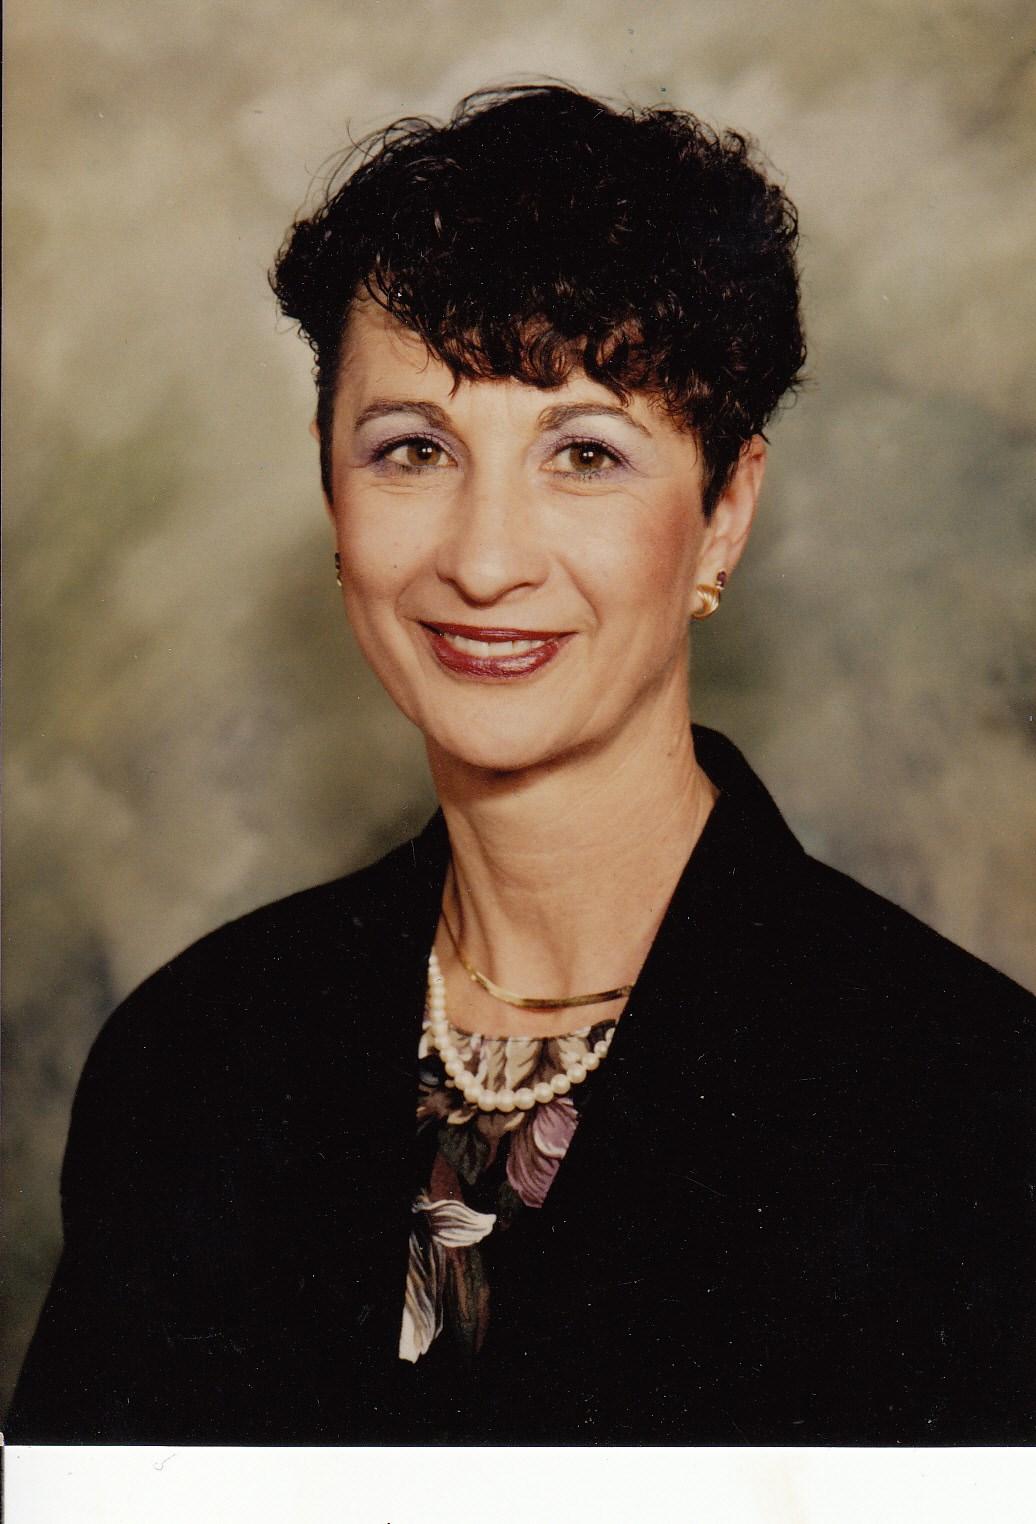 Brooke Elliott,Hilary Van Dyke Hot clips Sheena Easton (born 1959 (naturalized American citizen),Karyme Lozano